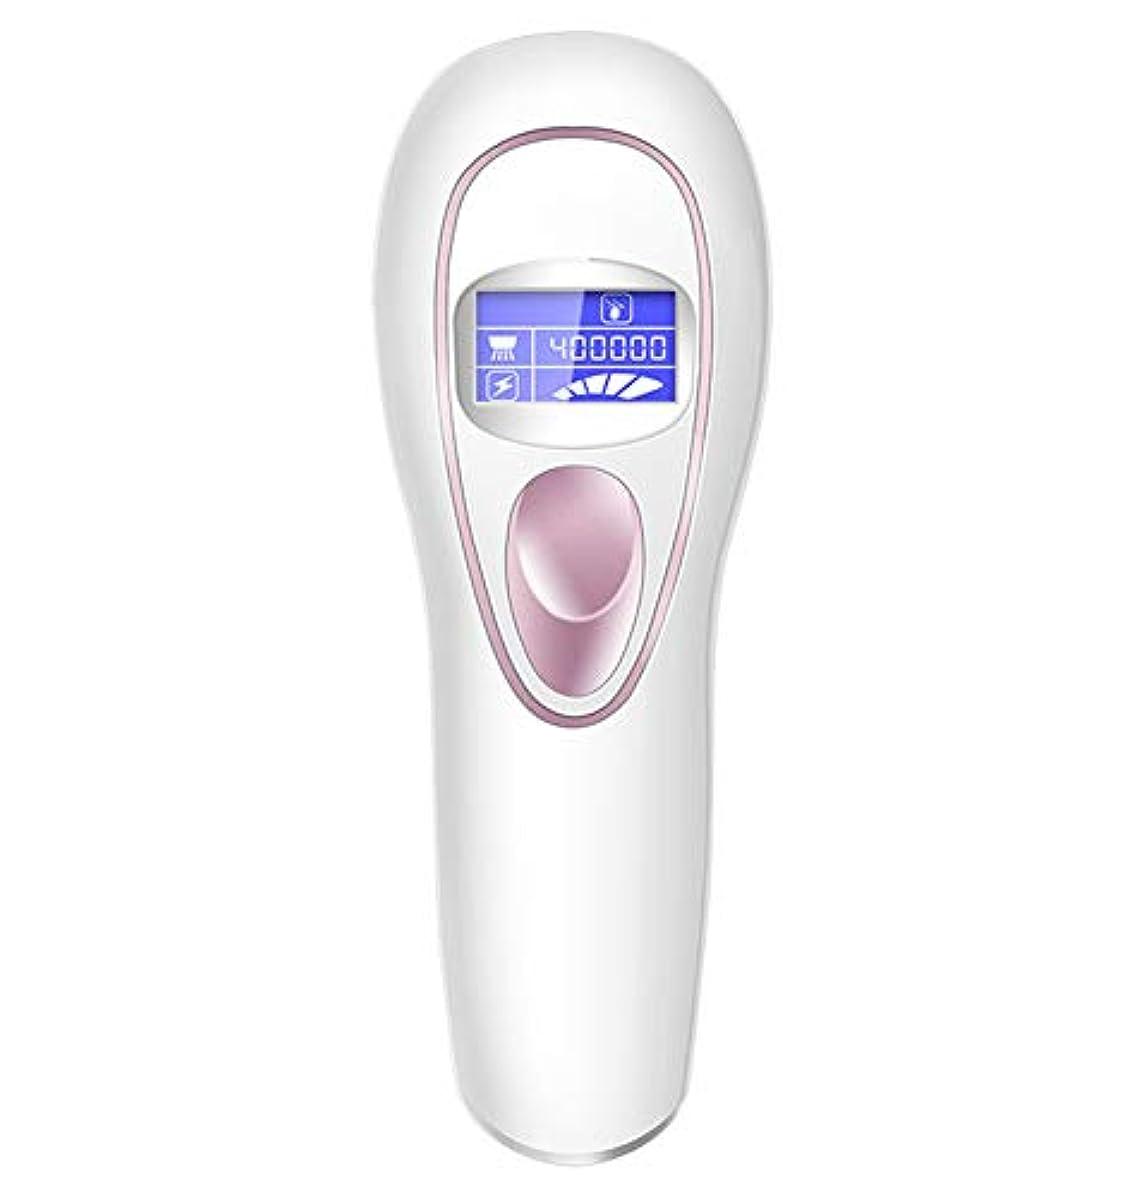 IPL脱毛システム、400,000回のフラッシュで冷却ケアIPL脱毛剤、体、顔、ビキニと脇の下に適して